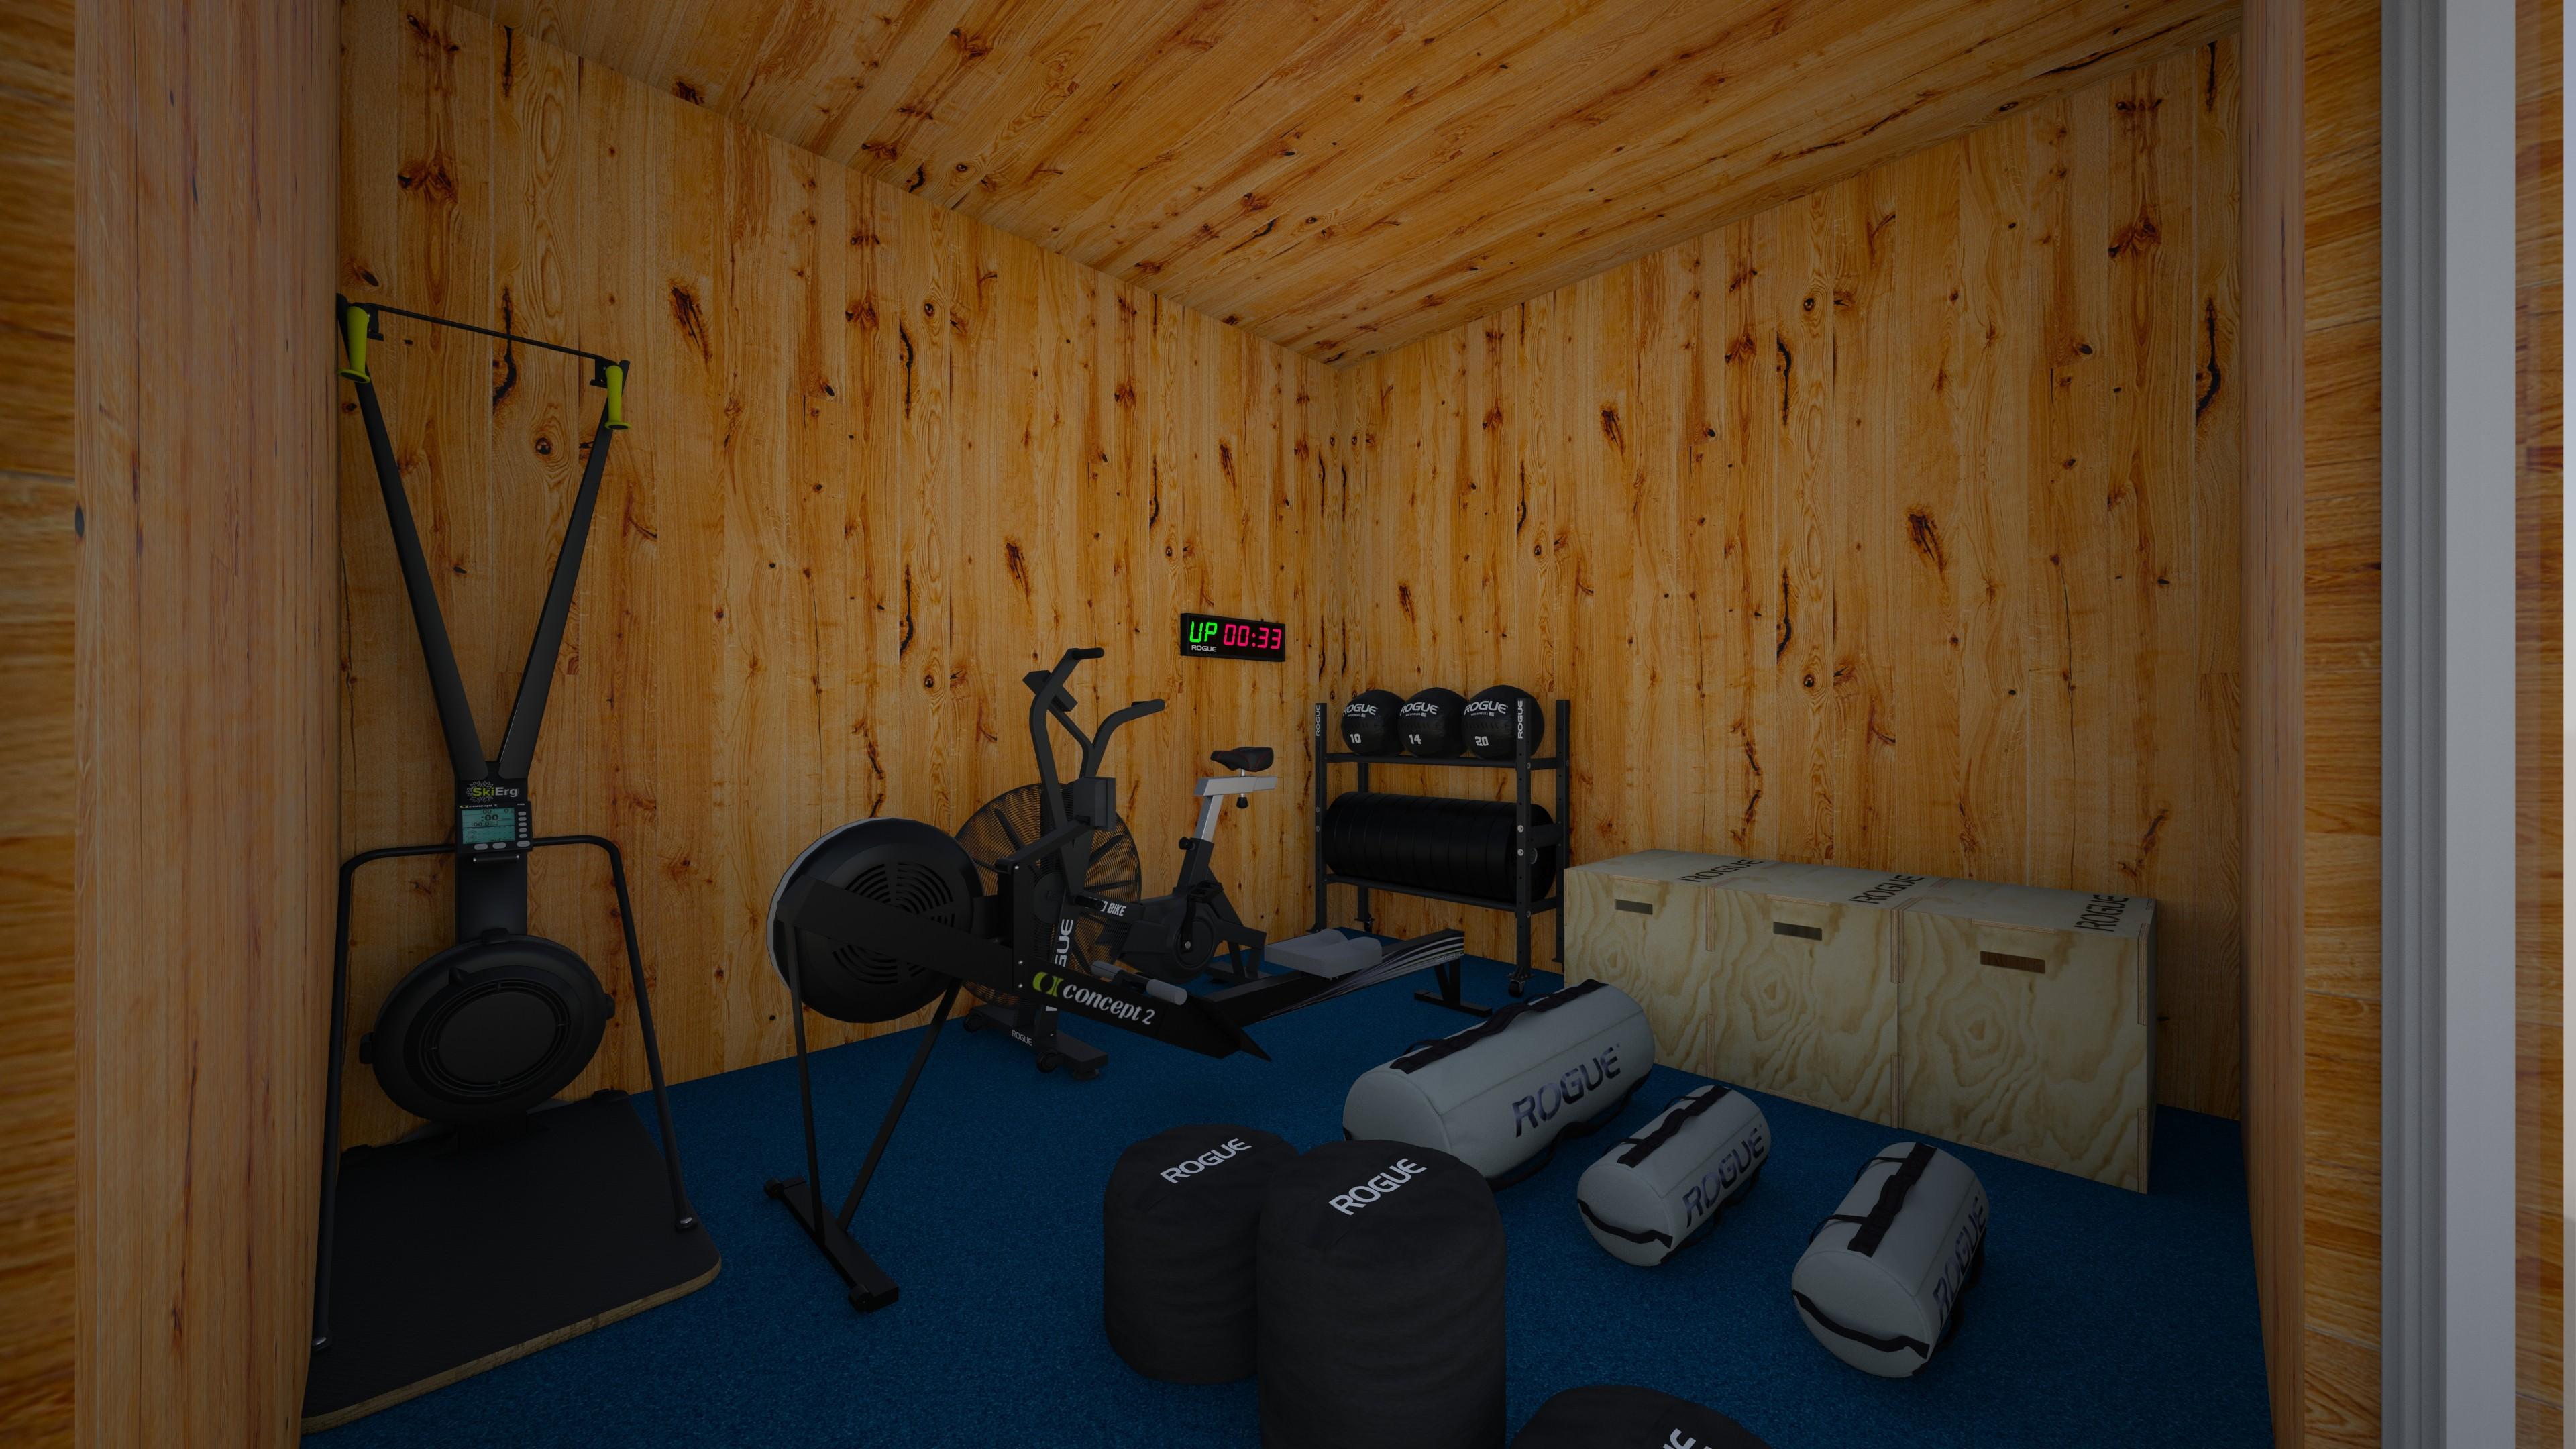 How to design a 3 6m x 4m Garden gym with Rogue